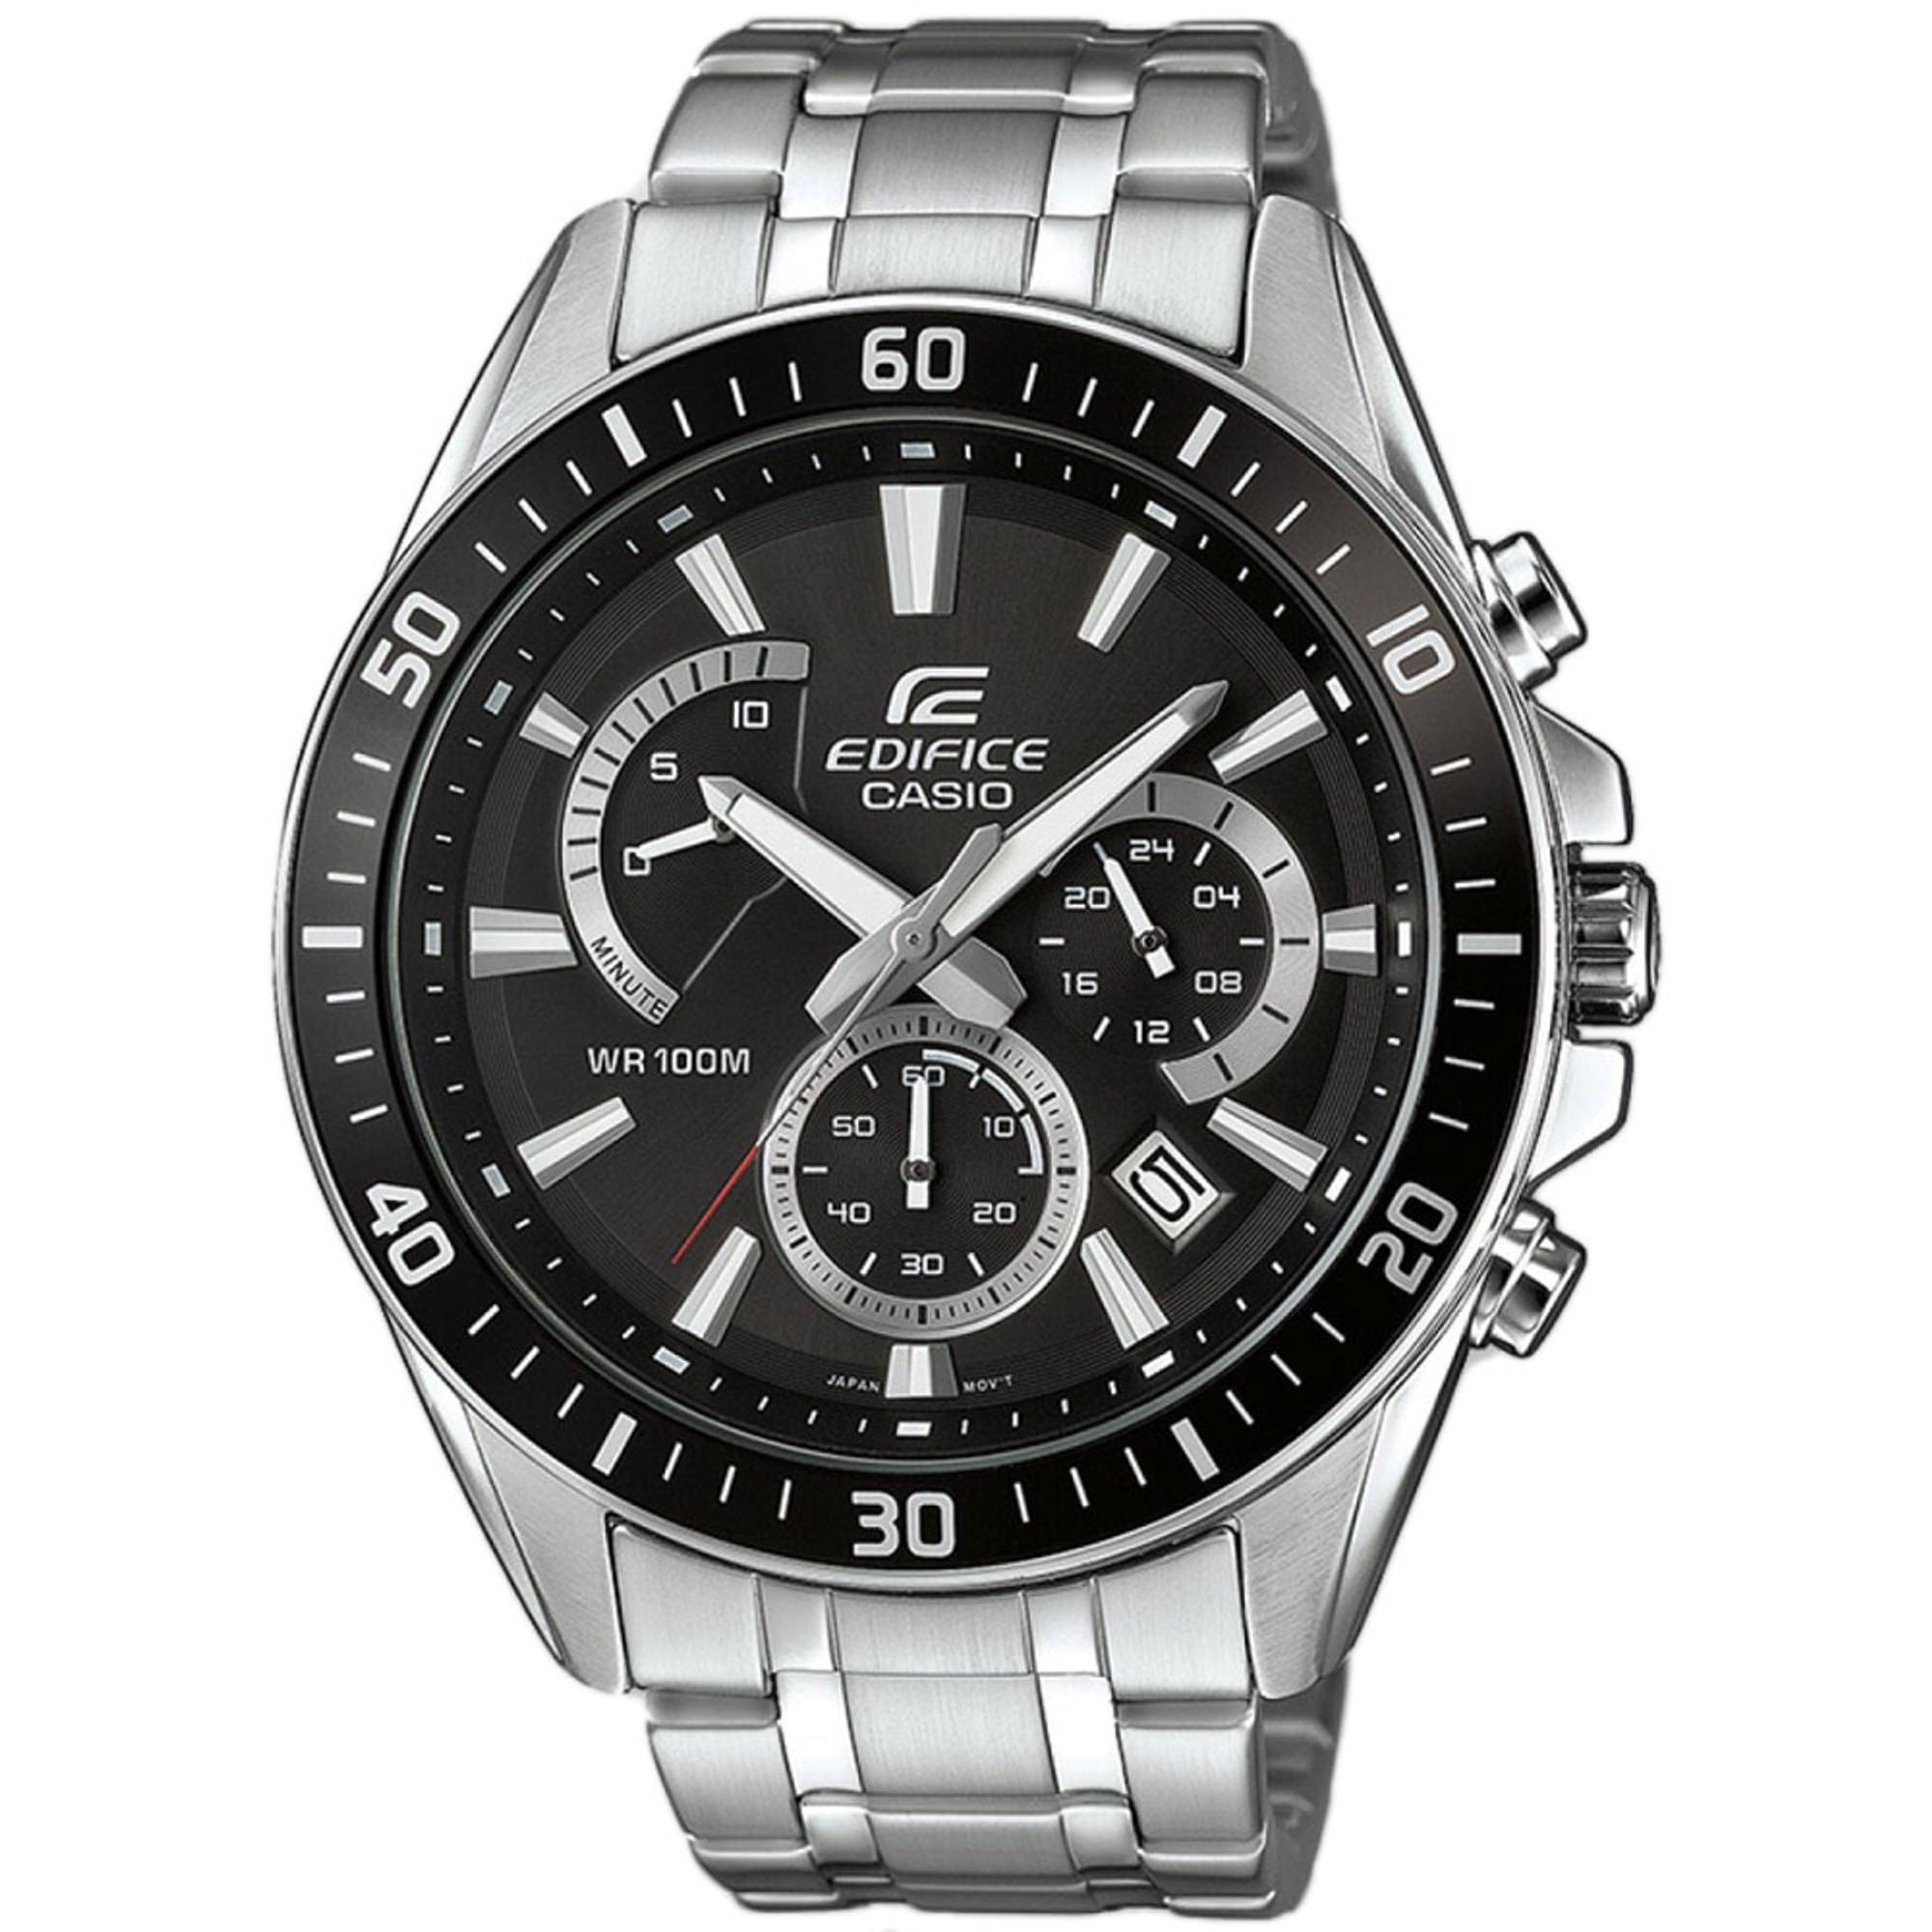 CASIO Edifice Quarz Chronograph EFR-552D-1AVUEF